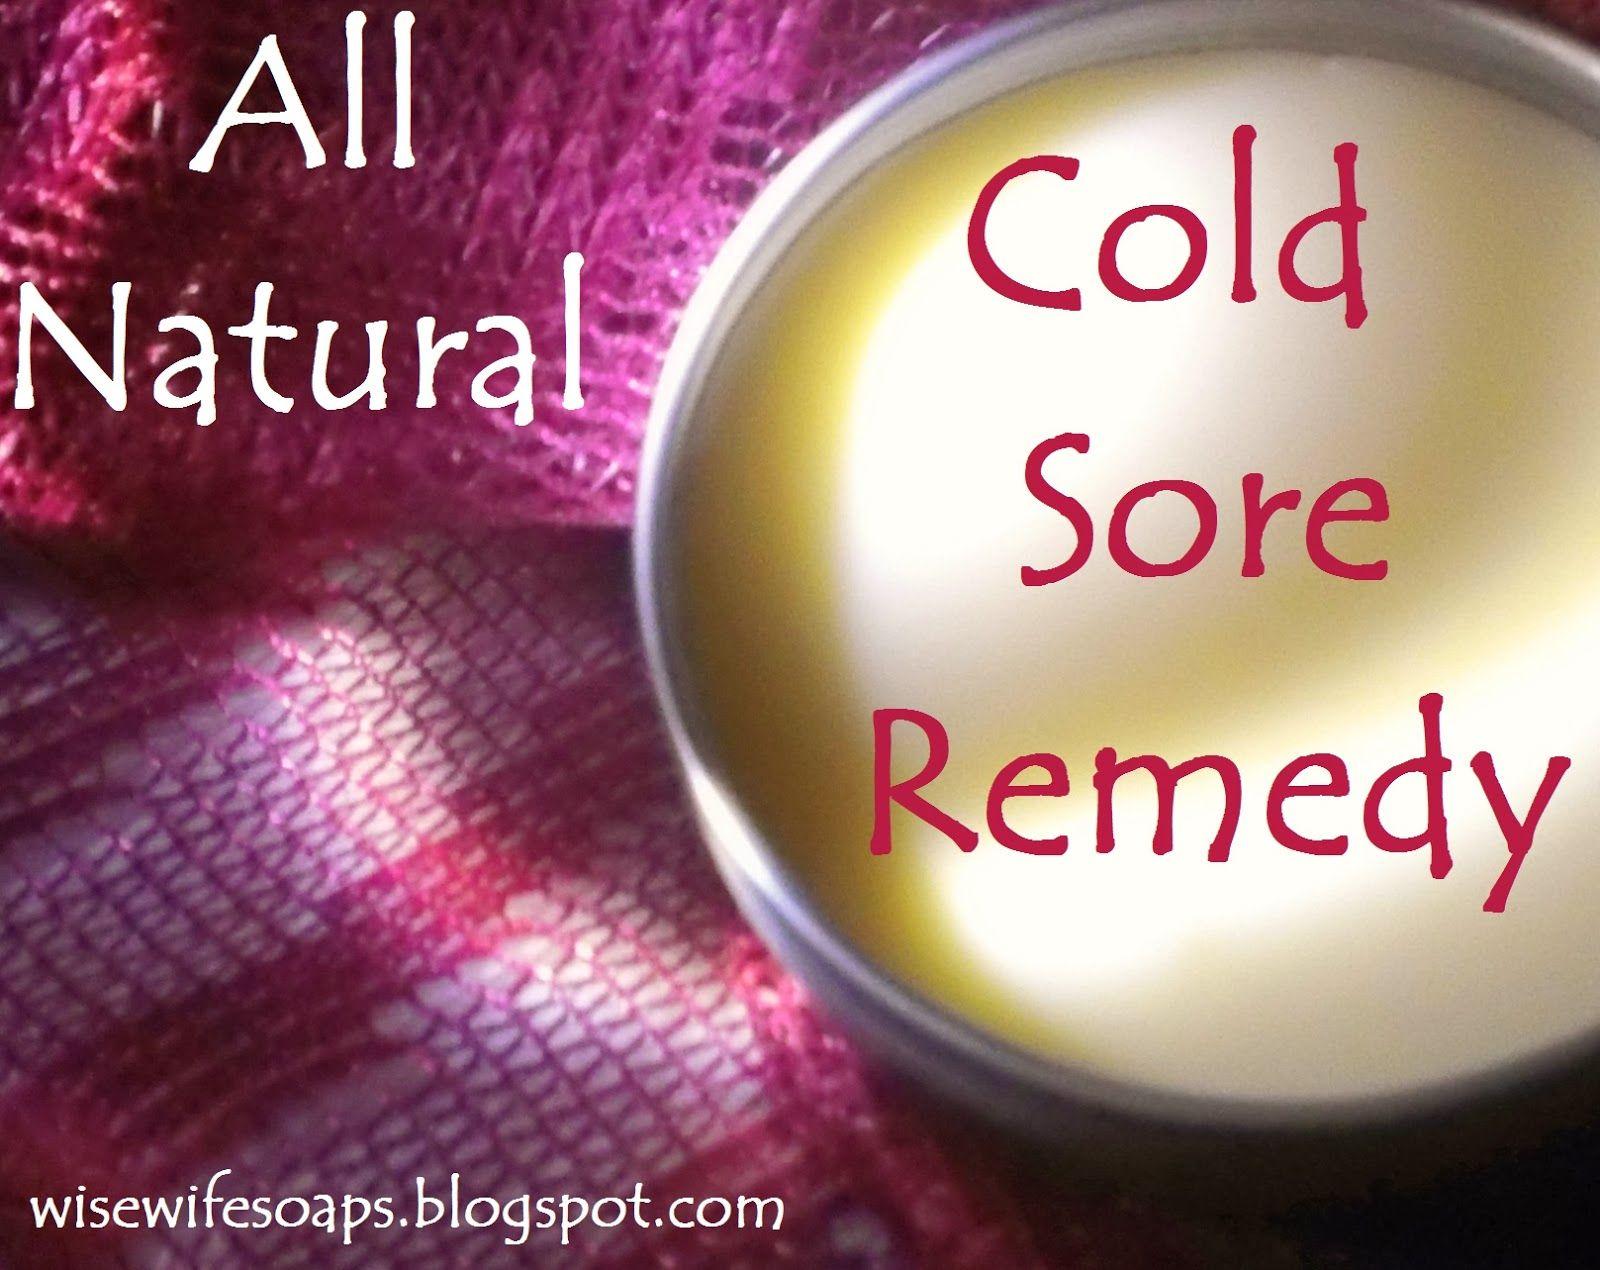 All Natural Cold Sore Remedy Natural Cold Sore Remedy